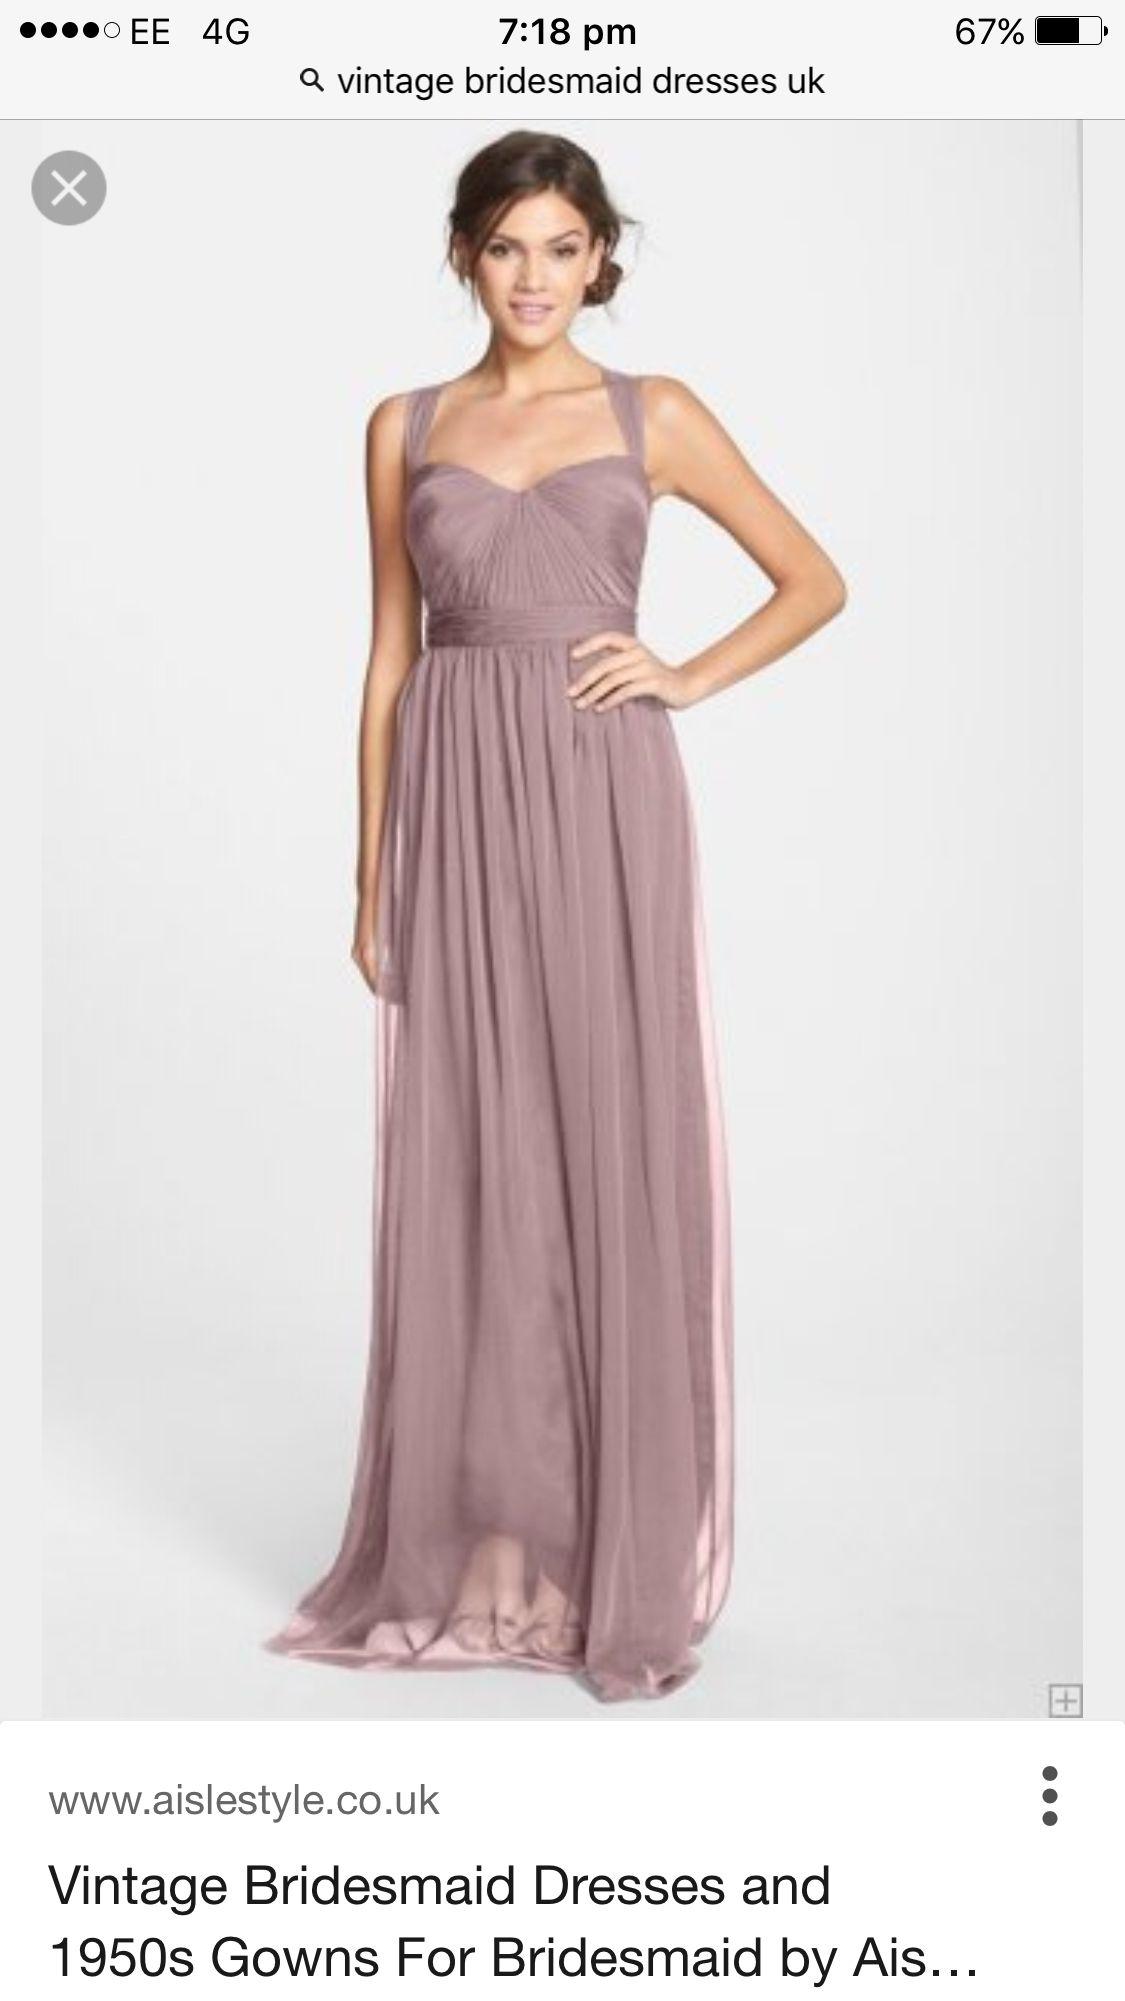 Beautiful mauve bridesmaid dress that day pinterest weddings beautiful mauve bridesmaid dress ombrellifo Images